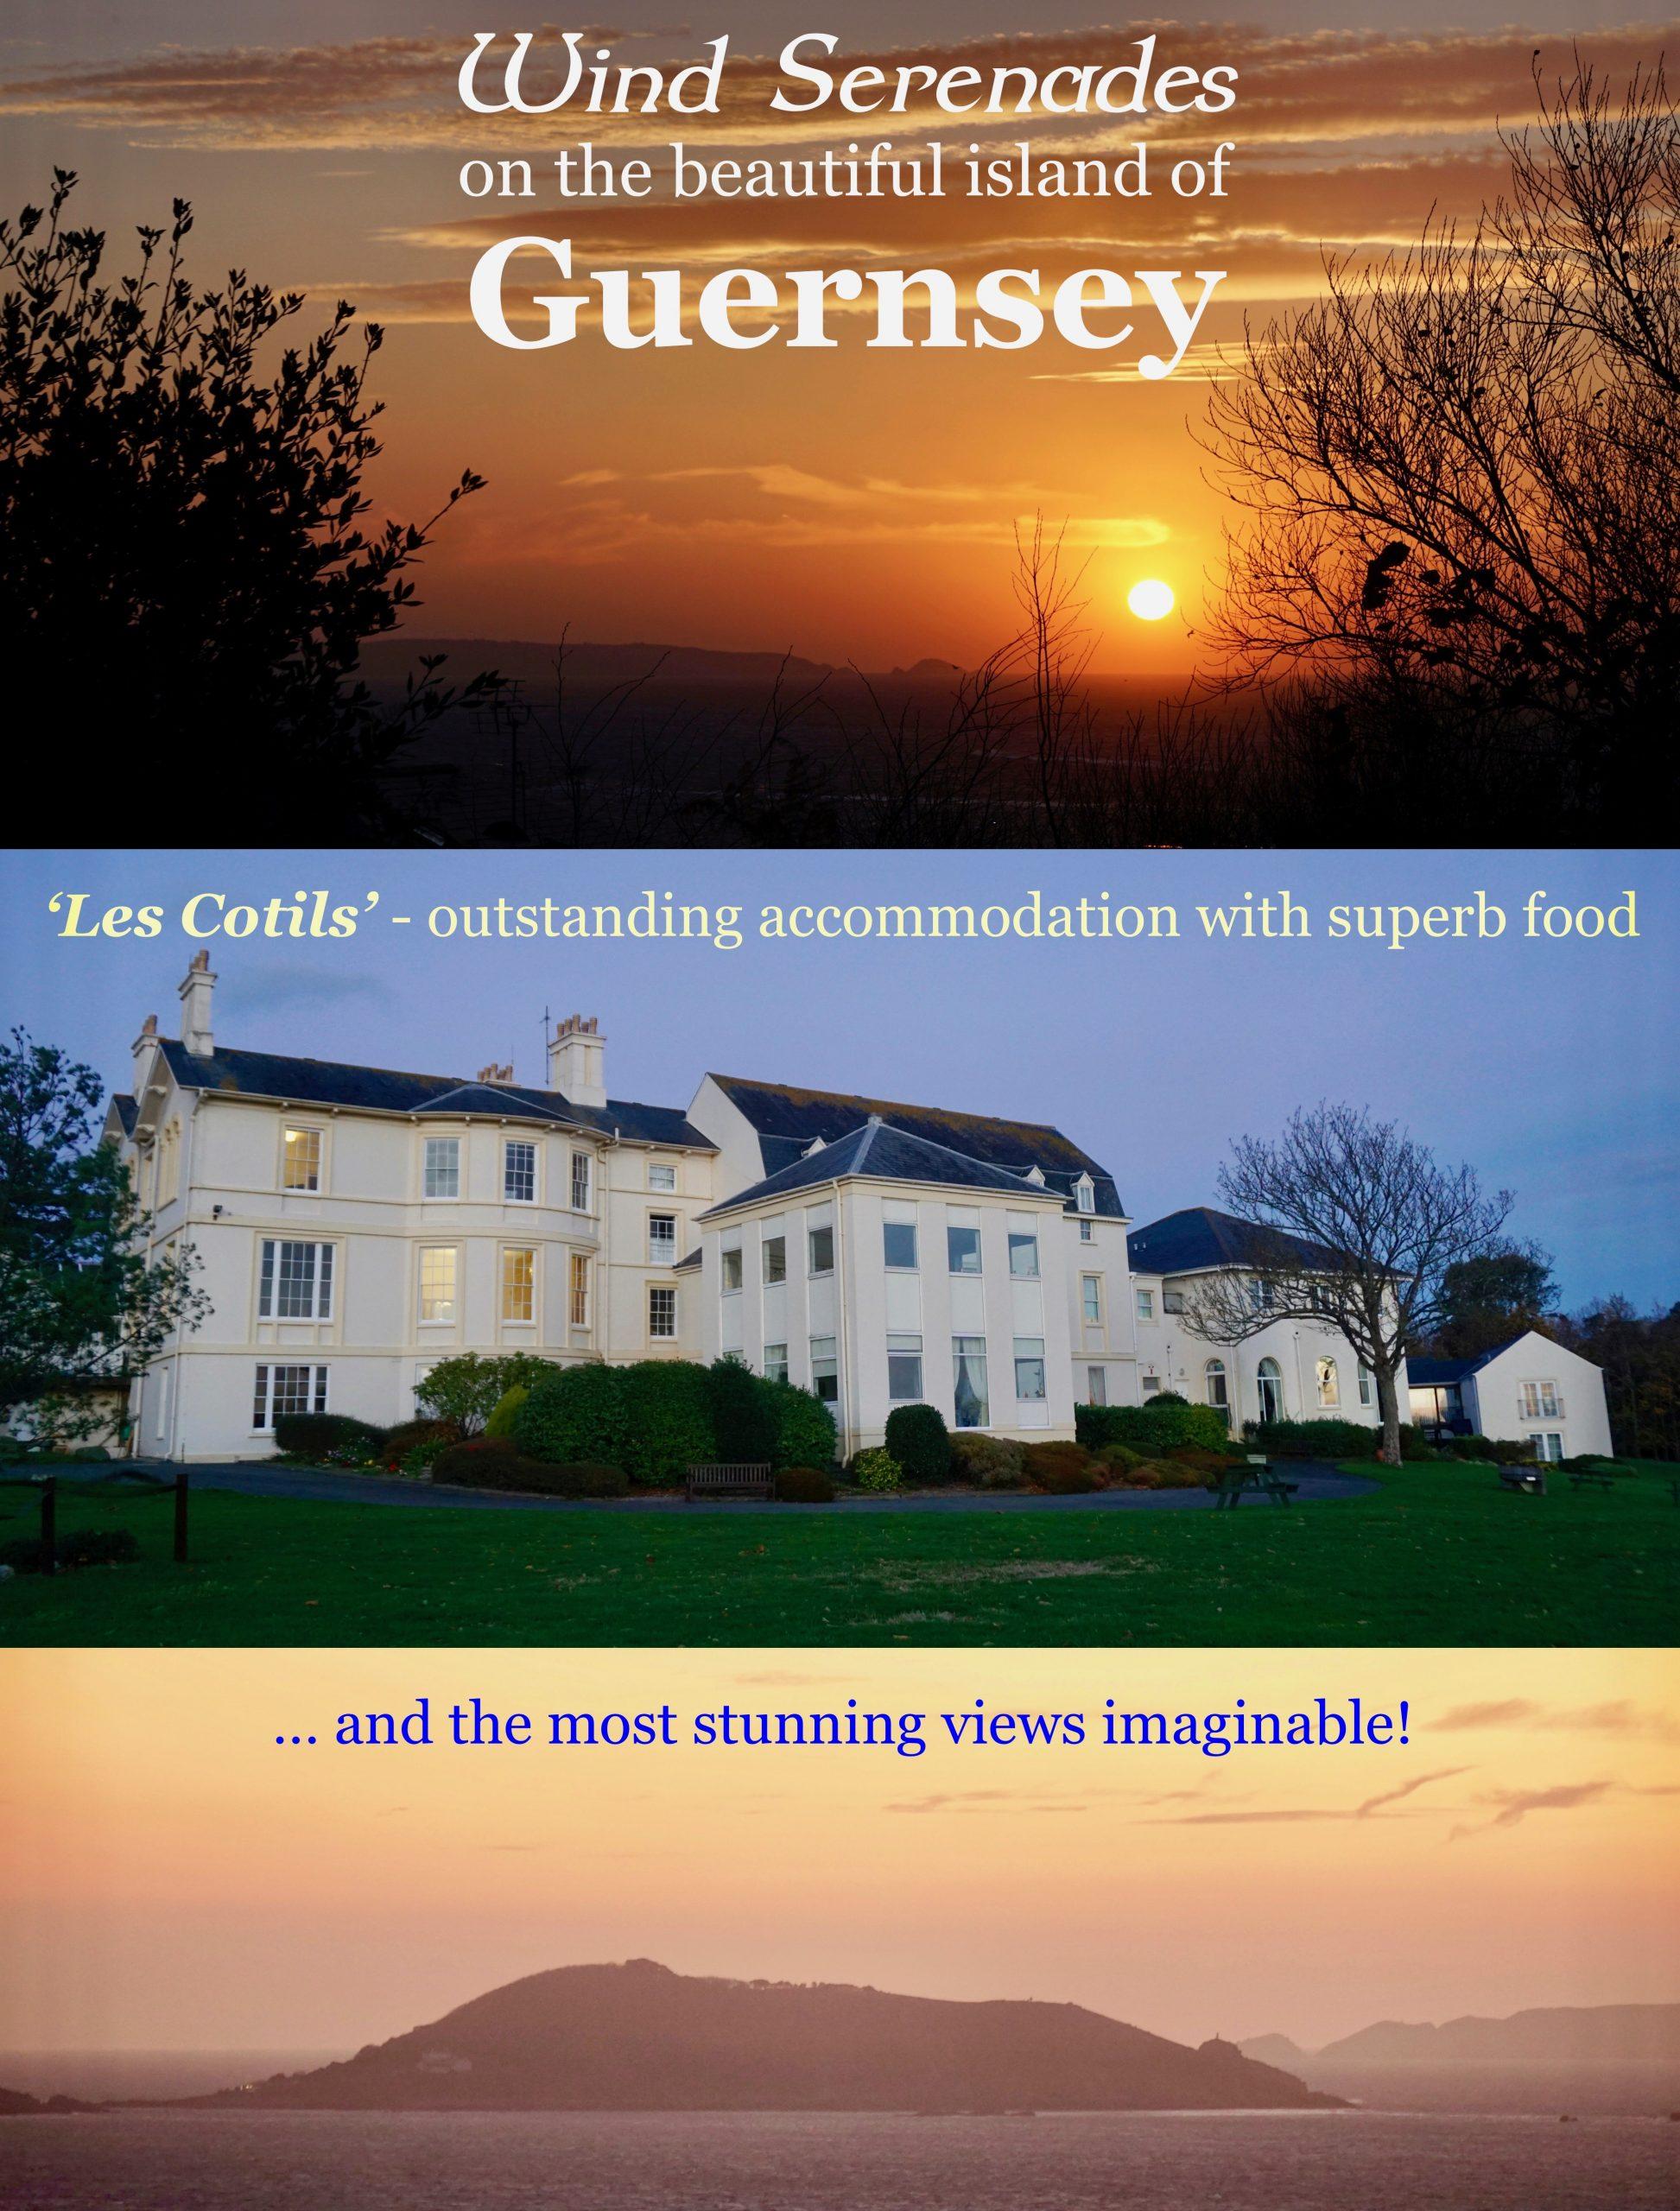 Guernsey photo panel for website JPG